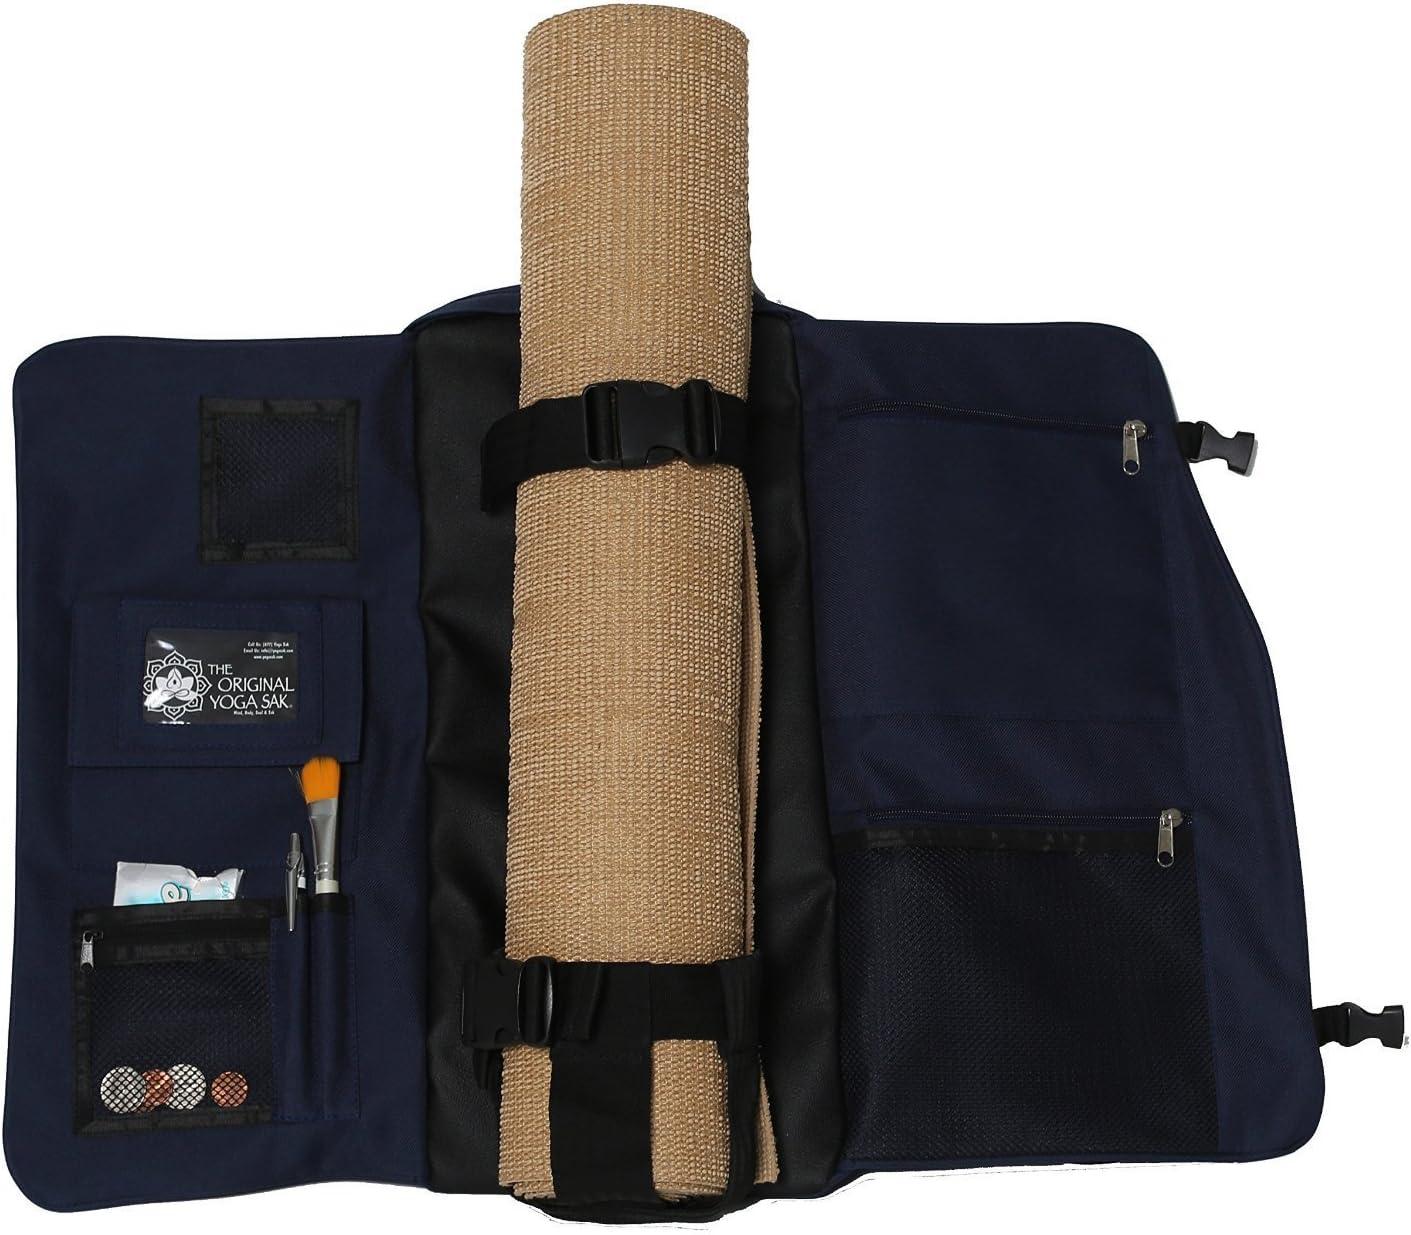 Yoga Sak The Ultimate Sport Bag/Multi Purpose Backpack. Fantastic for Yoga, Hiking, Biking, Travel, Gym, School/Office